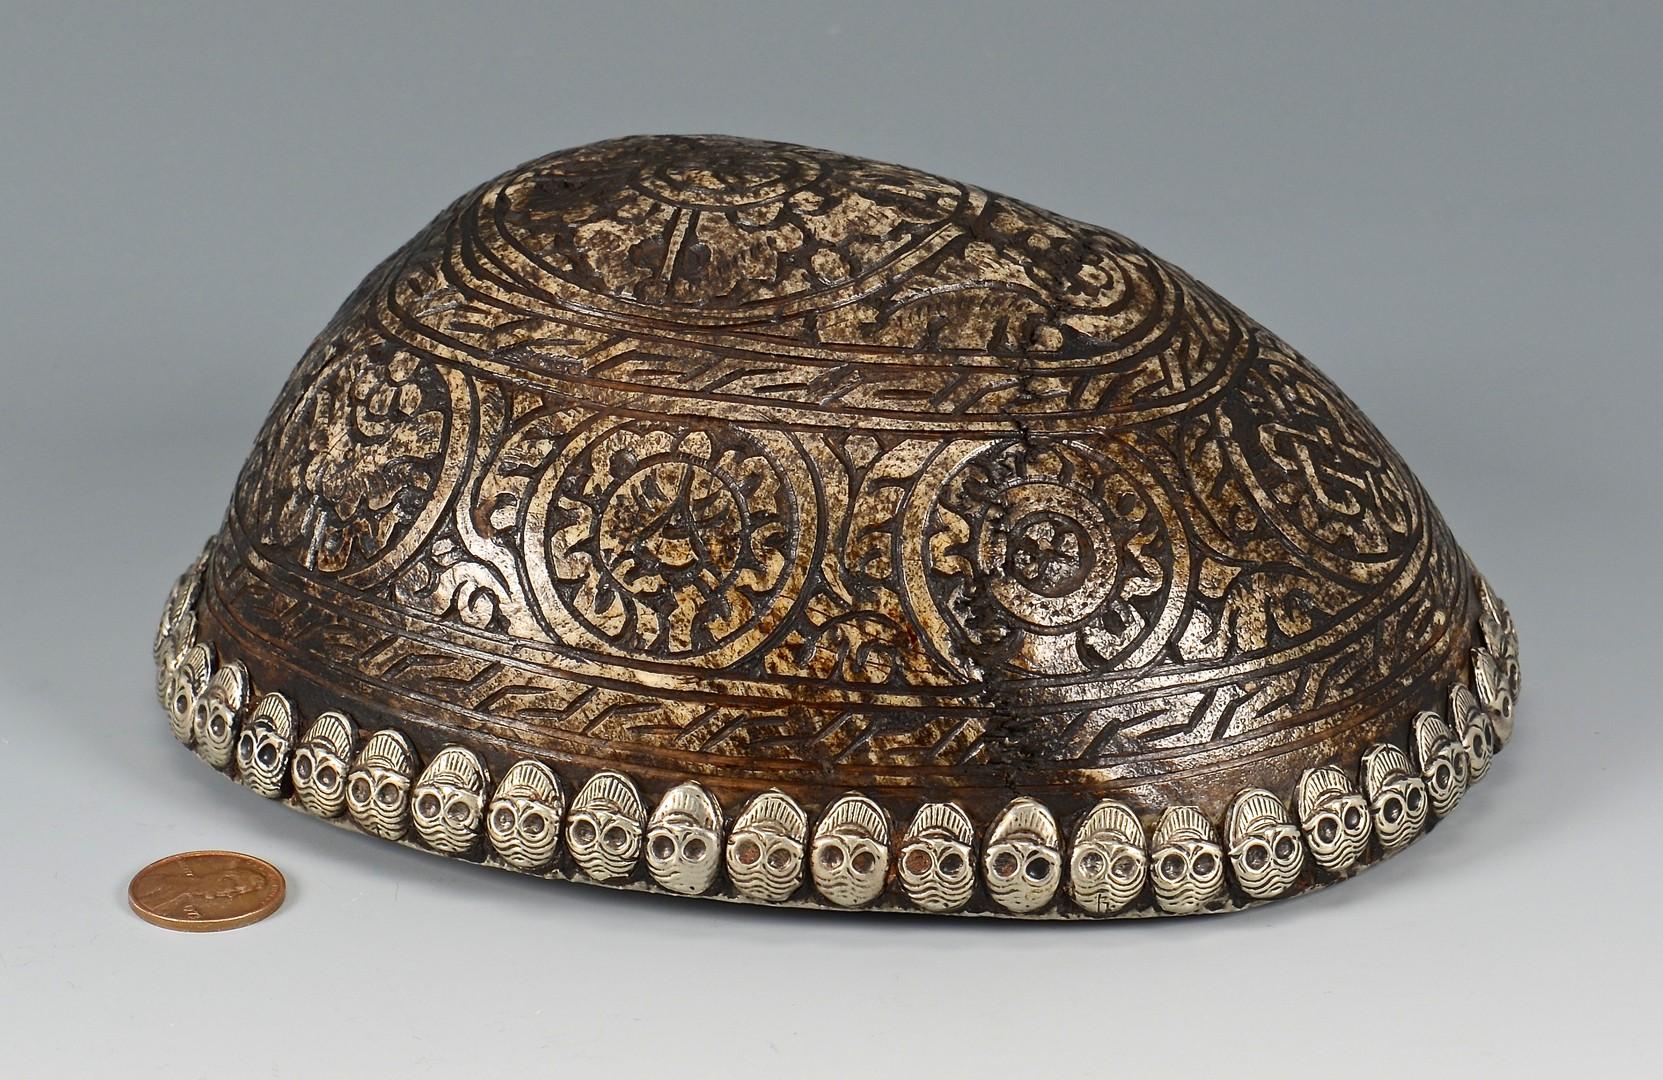 Lot 4010098: Tibetan Tea Bowl & Silver Mounted Skull Bowl